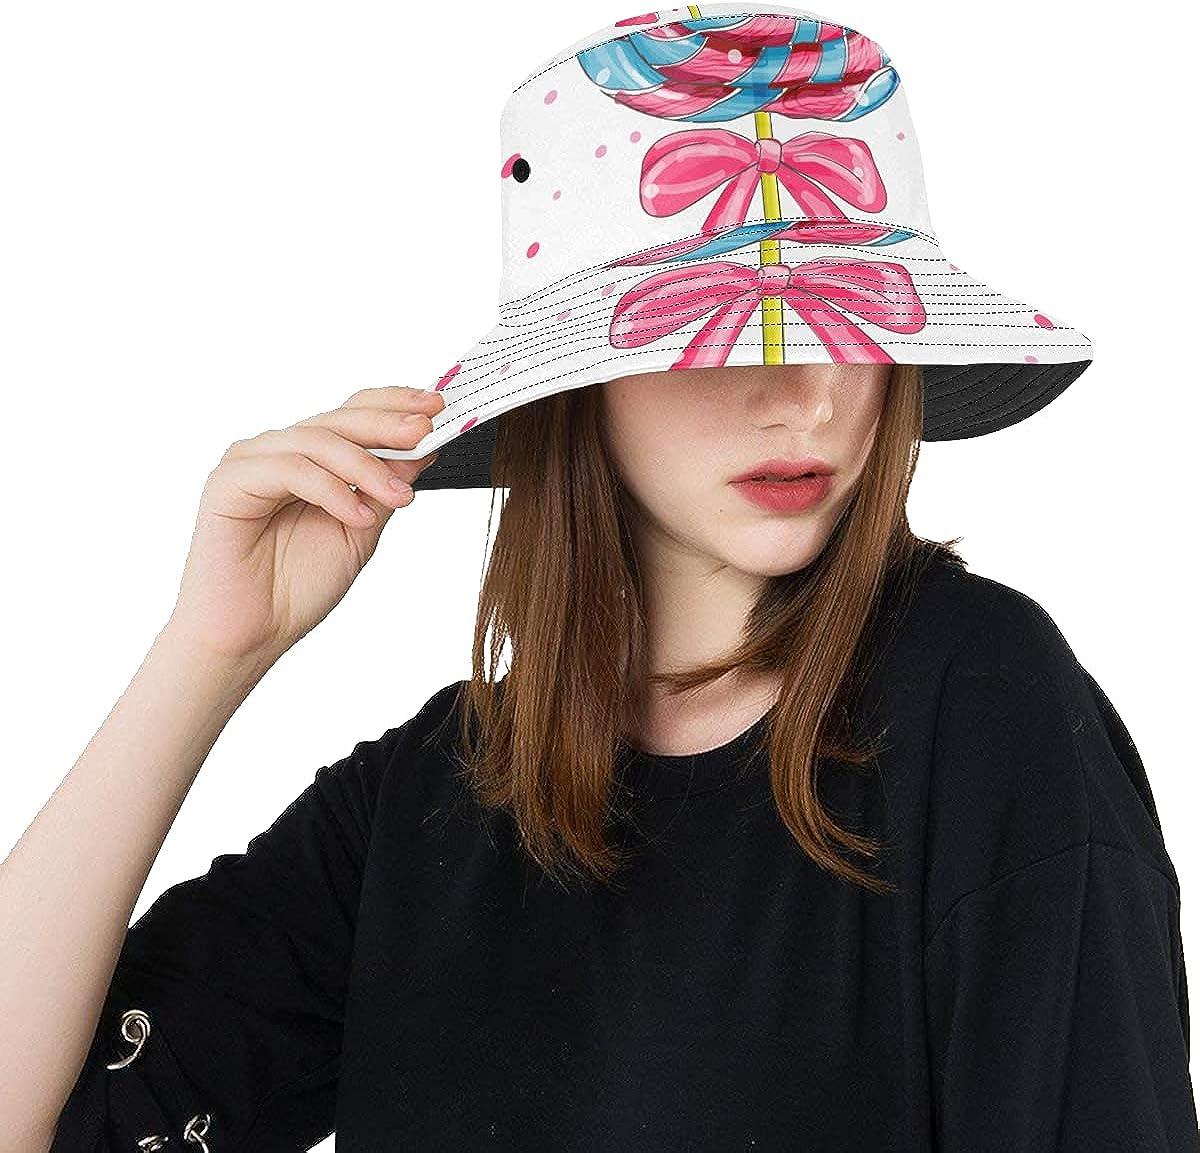 Men Fishing Hat Colorful Limited price Lollipop Summer Design Unisex Set Sweet Ranking TOP15